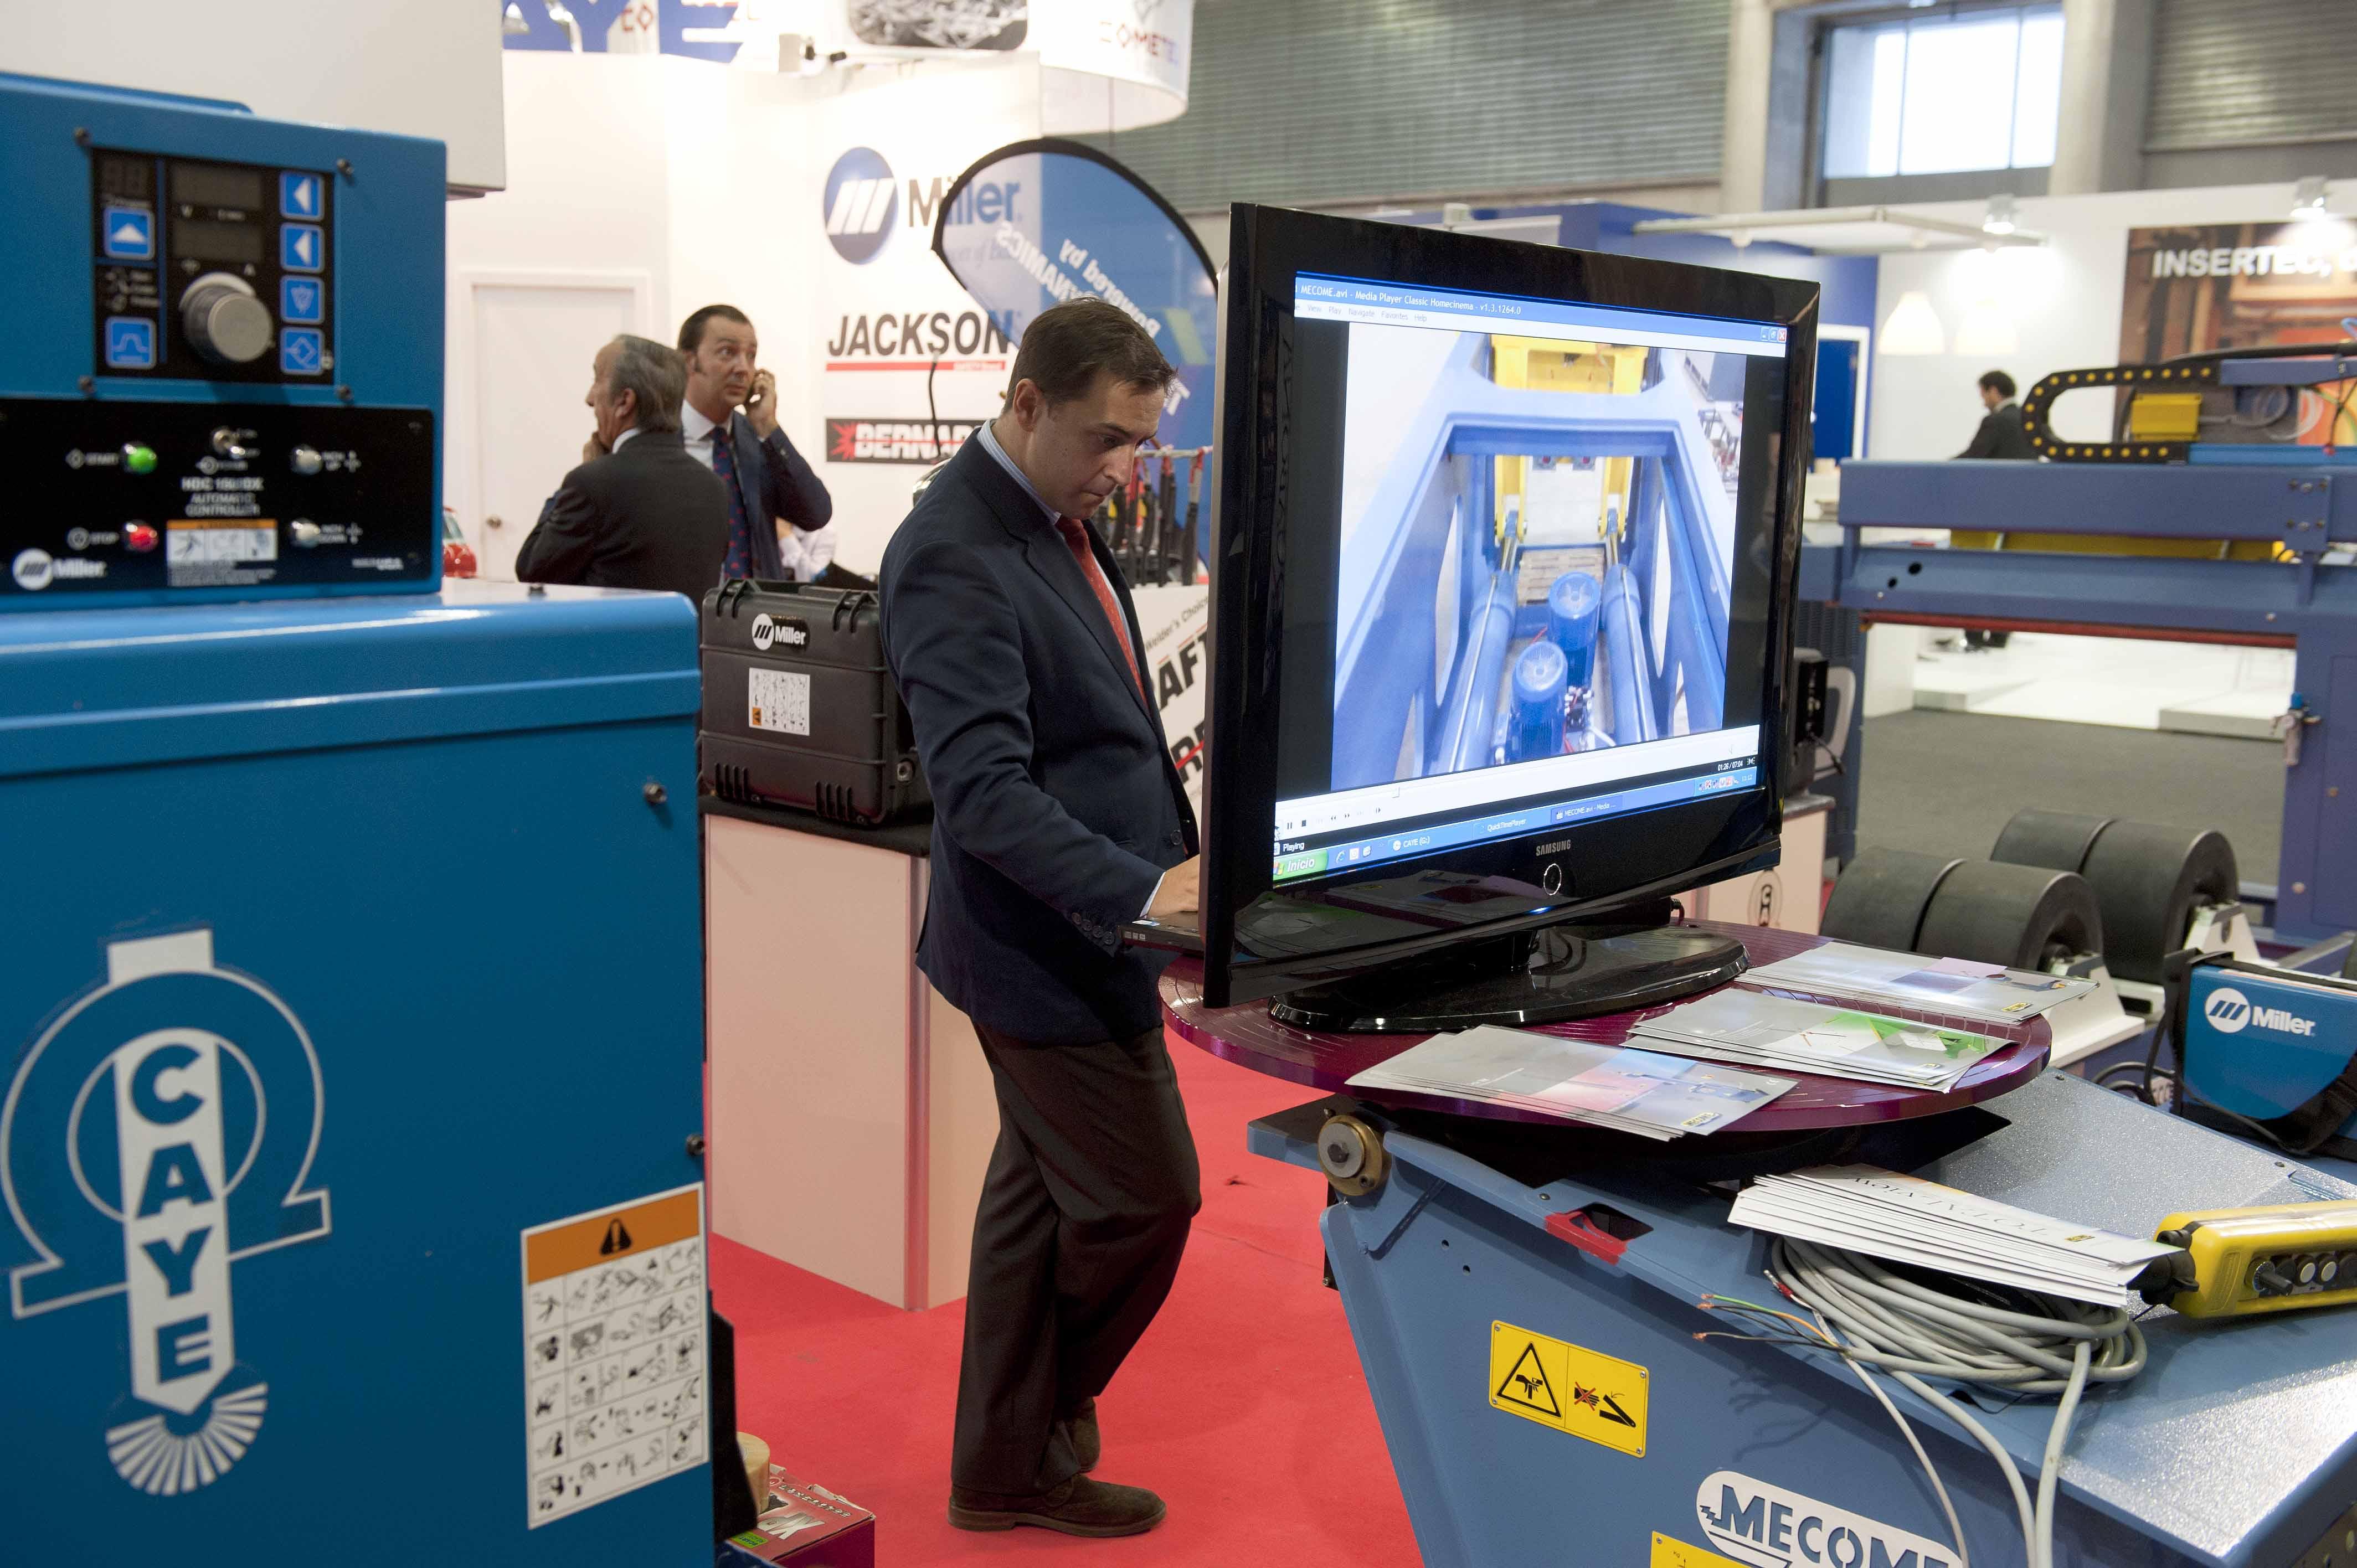 2011_09_27_industria_cumbre_industrial3.jpg